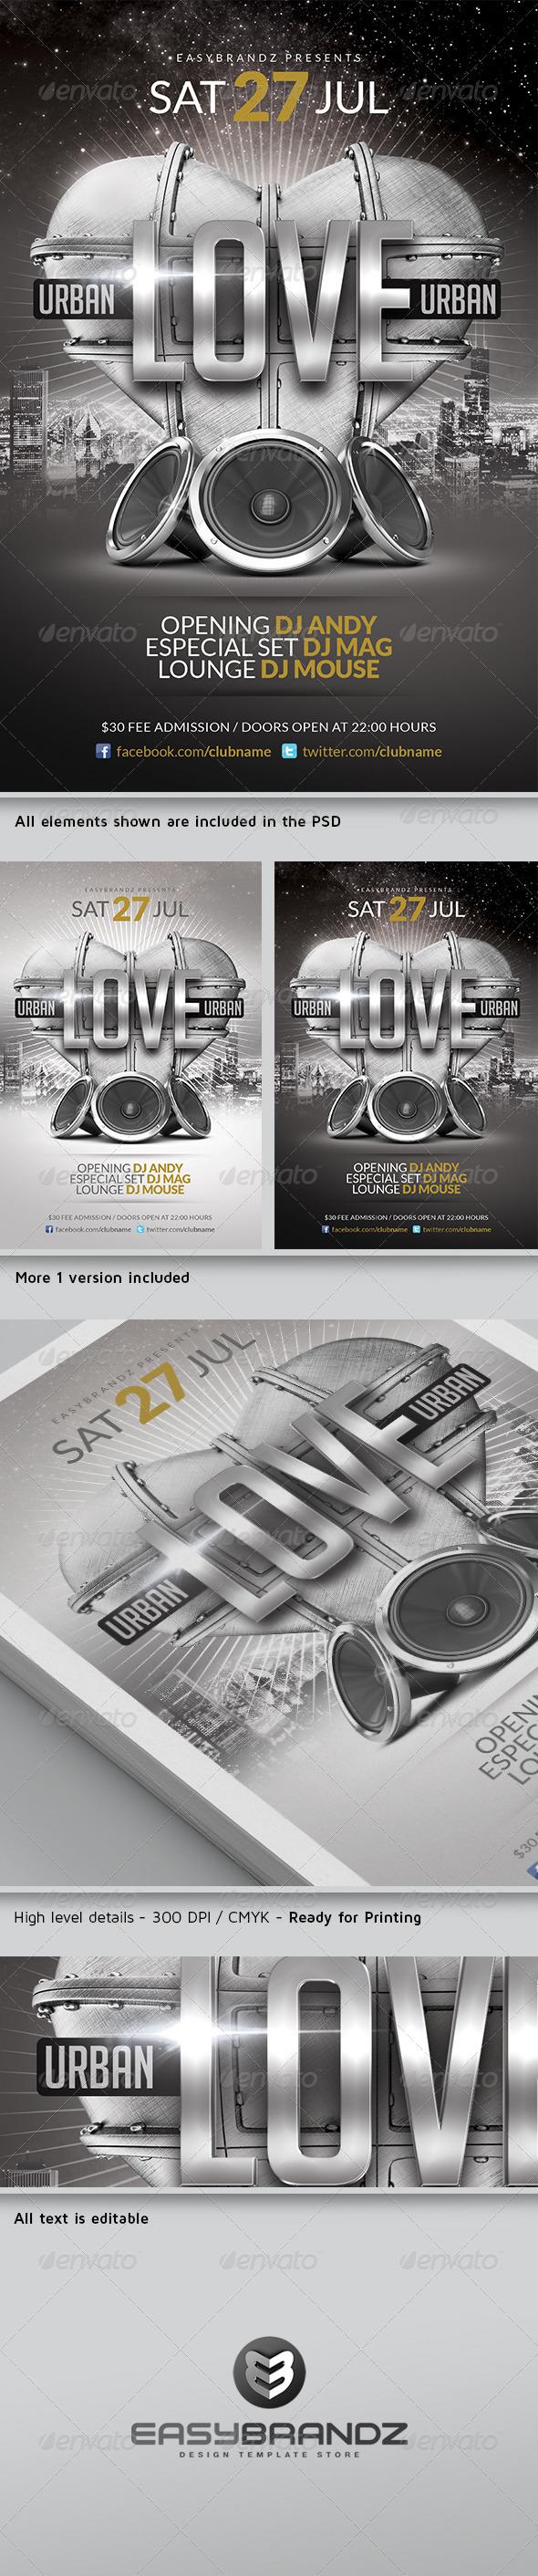 GraphicRiver Urban Love Flyer Template 5062620